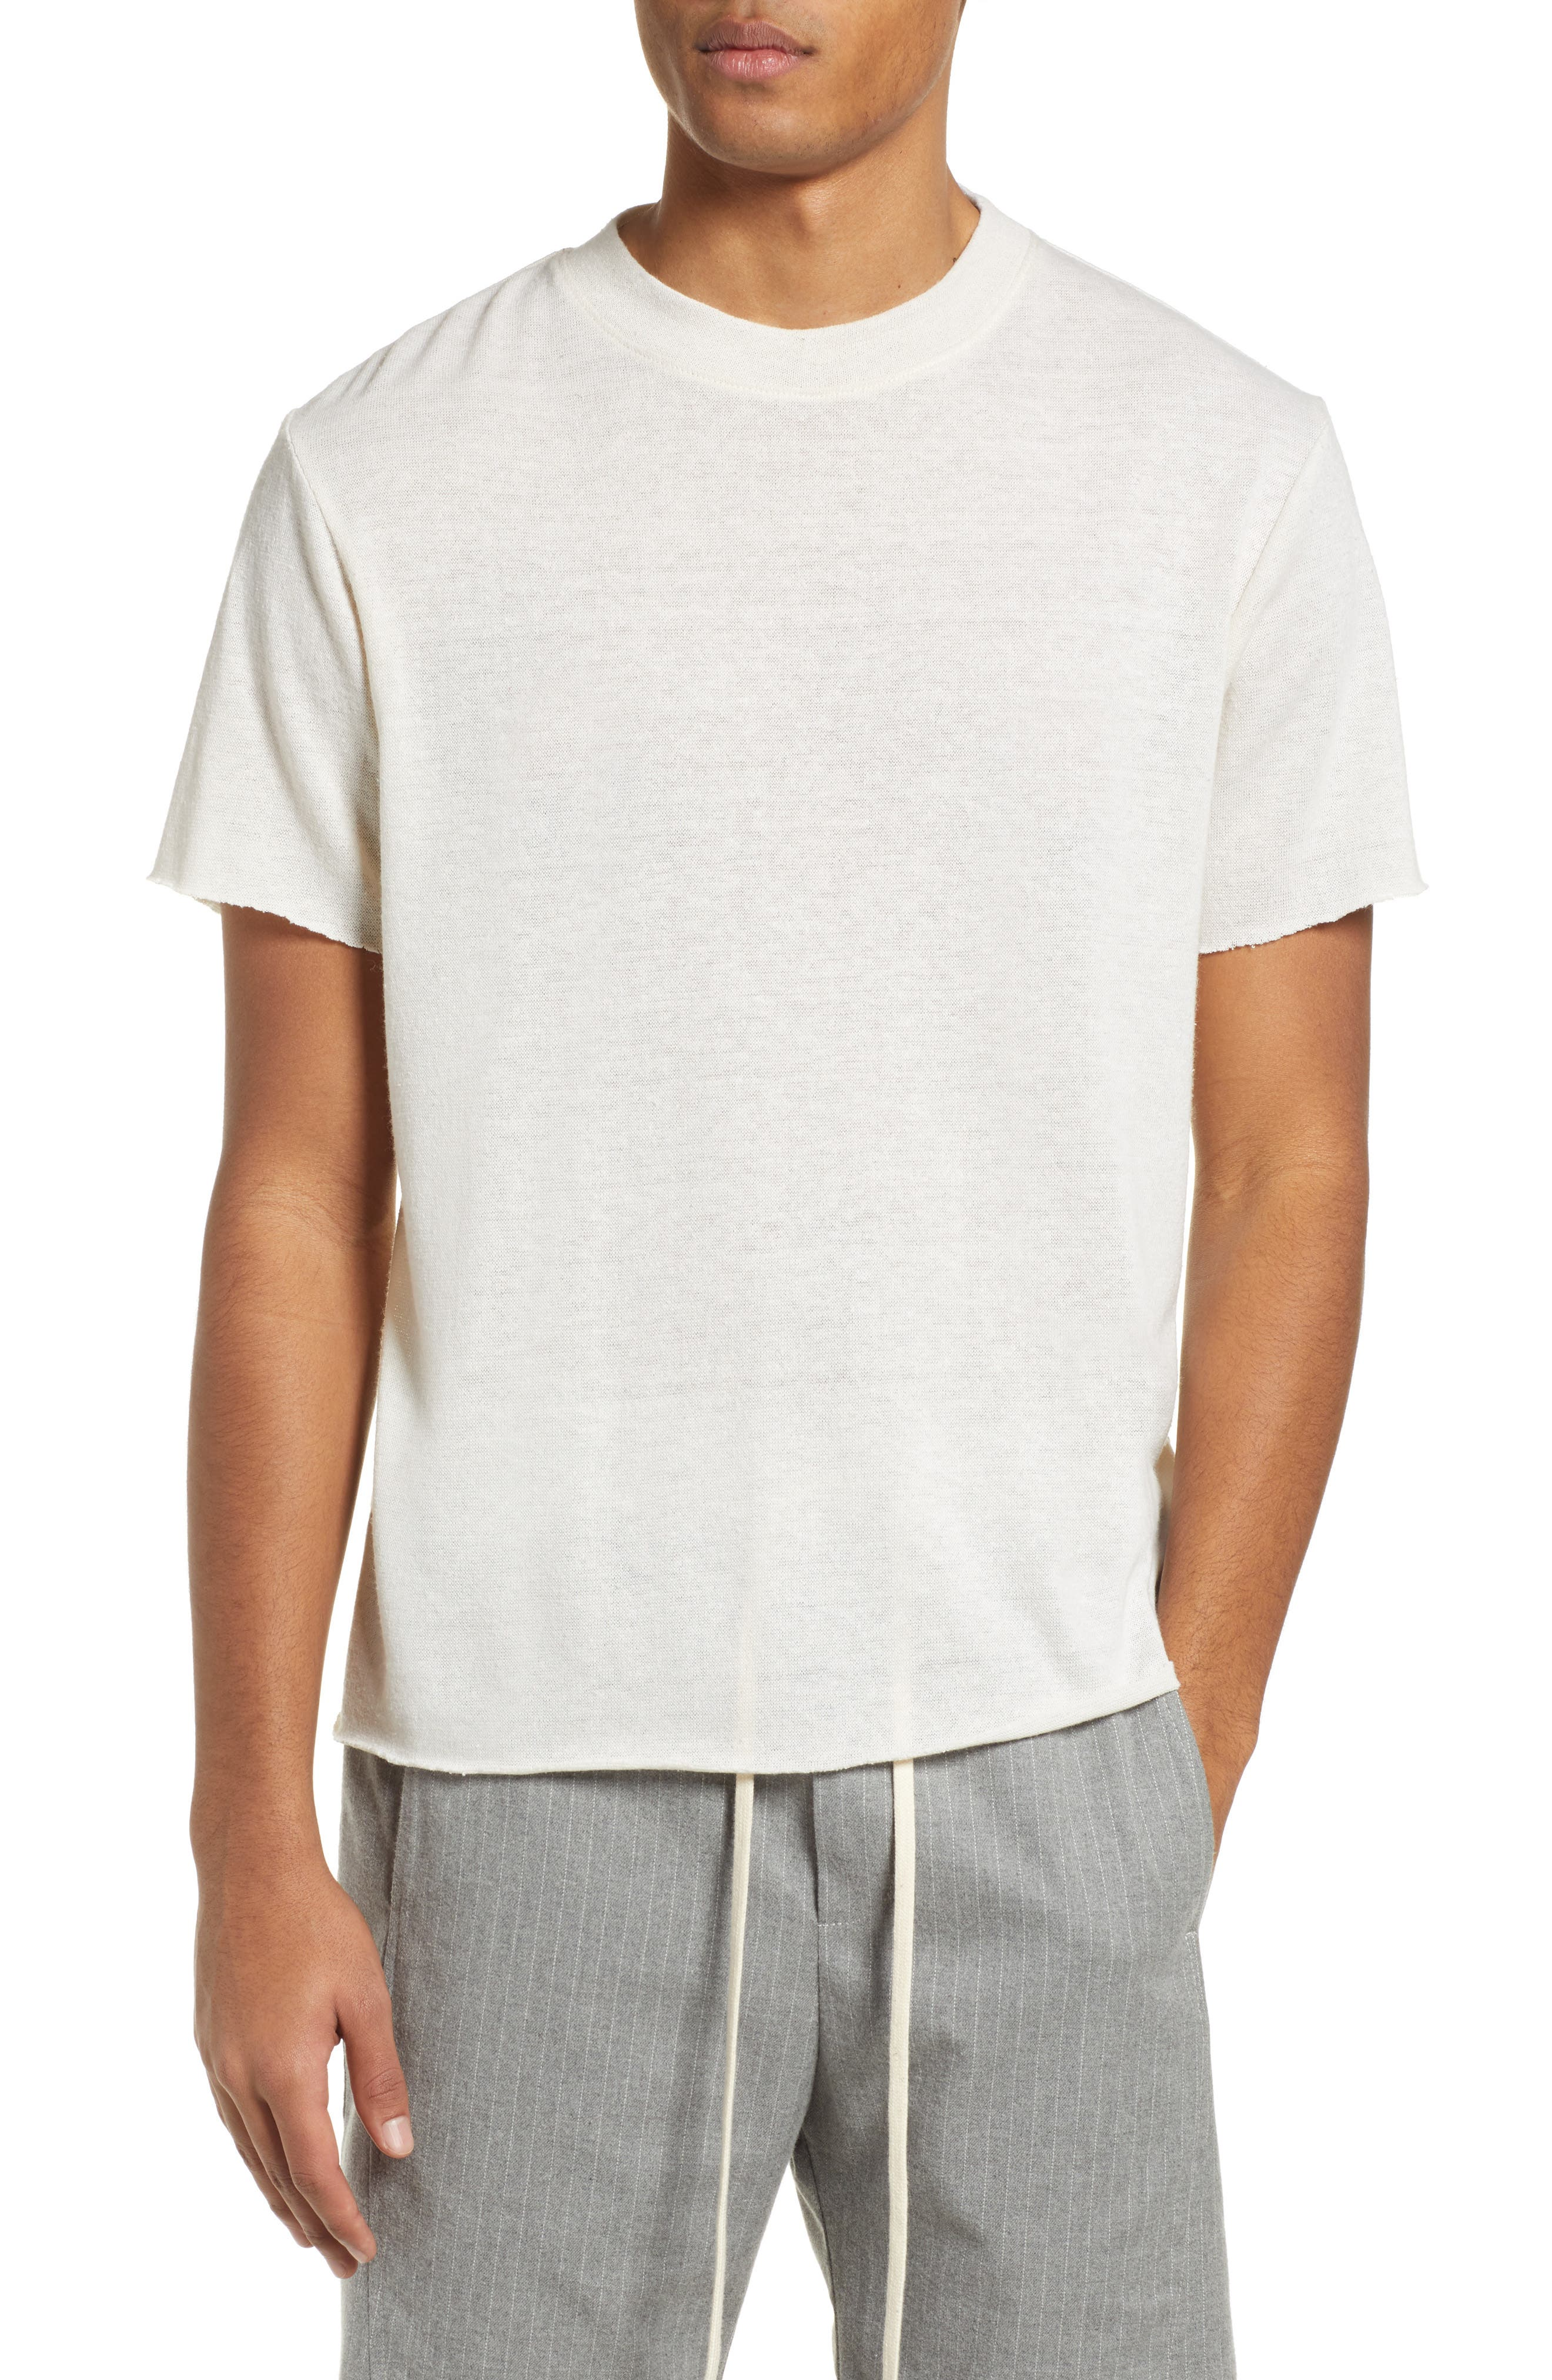 Twenty Commune Raw Hem T-Shirt, Ivory